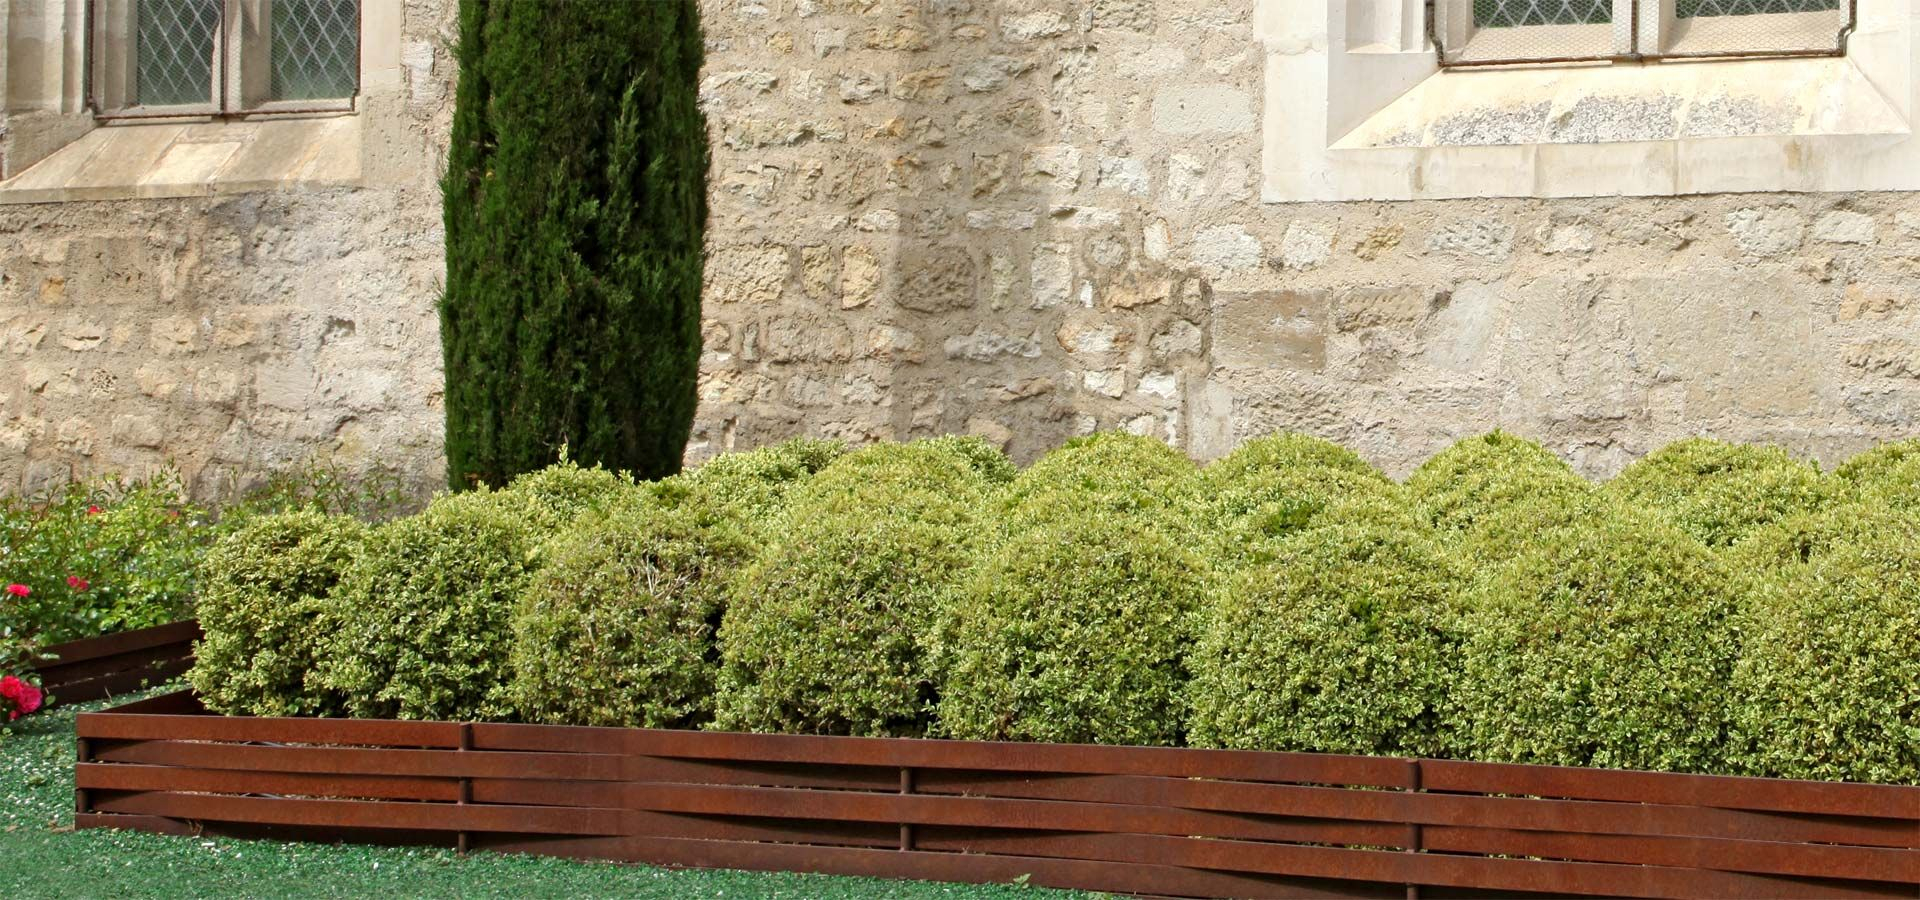 Bordure En Plessis Corten De Retenue De Talus. #jardin ... pour Bordure Jardin Acier Corten